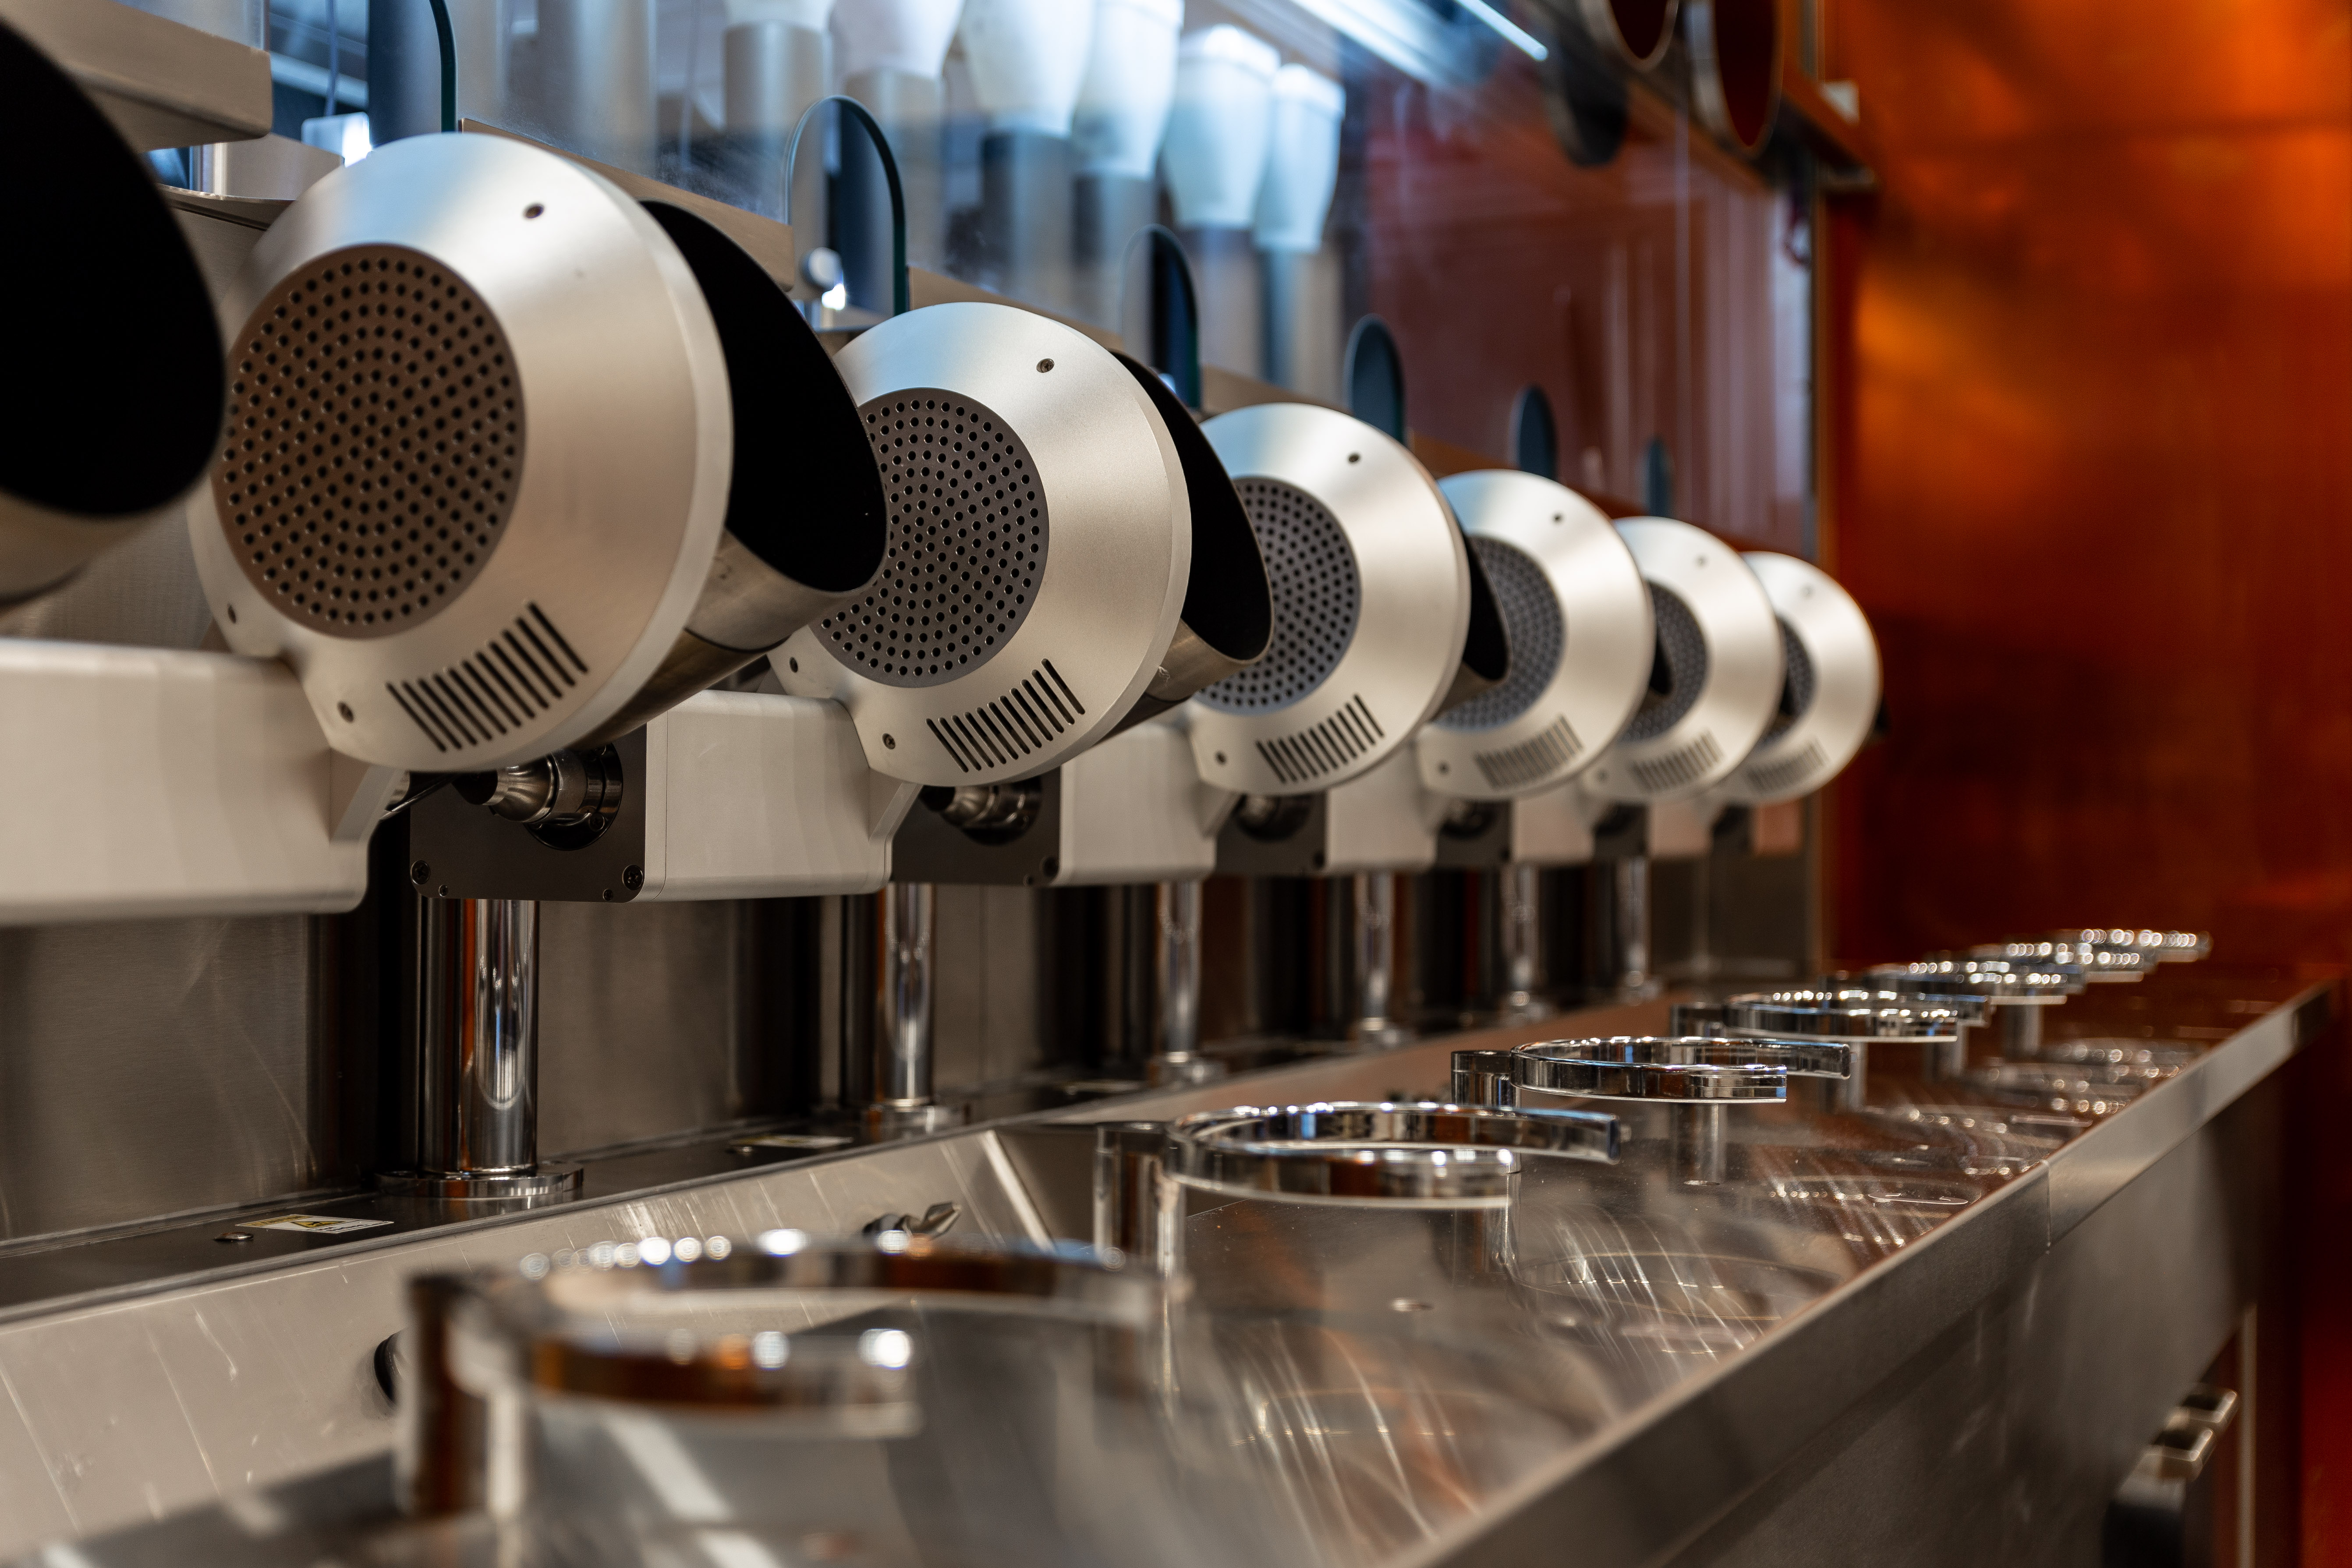 Spyce-Restaurant-Robotic-Kitchen-Boston-Close-up-of-Woks